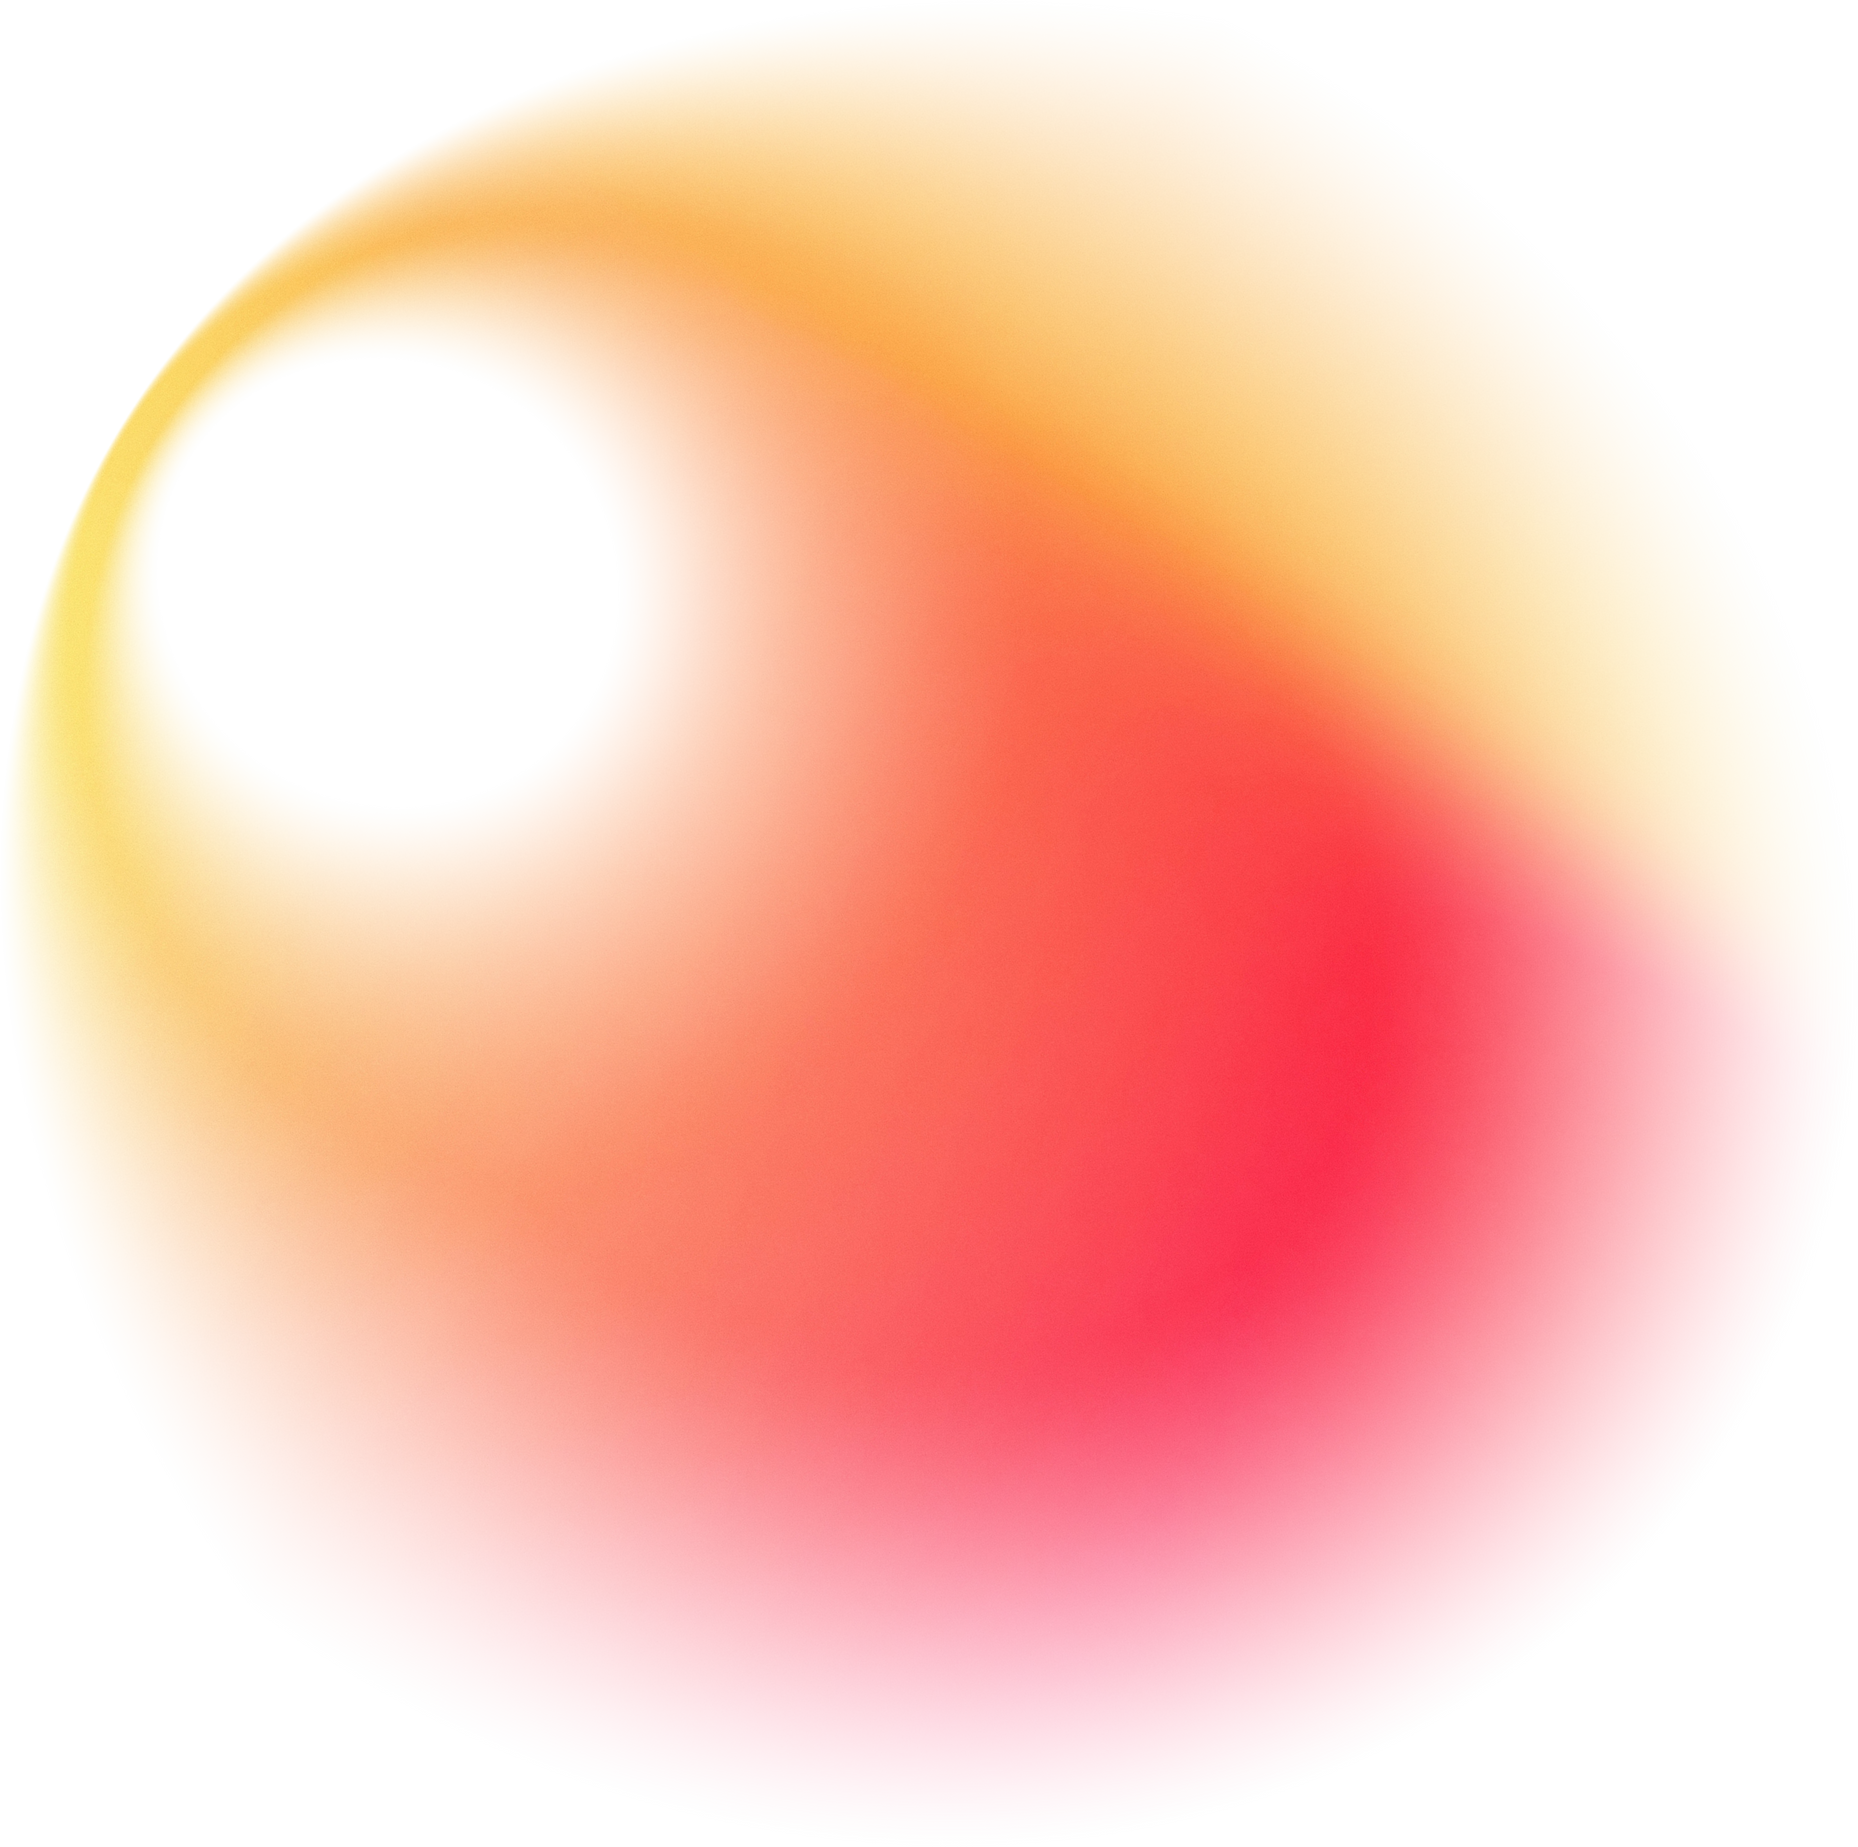 Kuro_Chroma_Grainy_Gradients_Abstract_Shapes_14.png